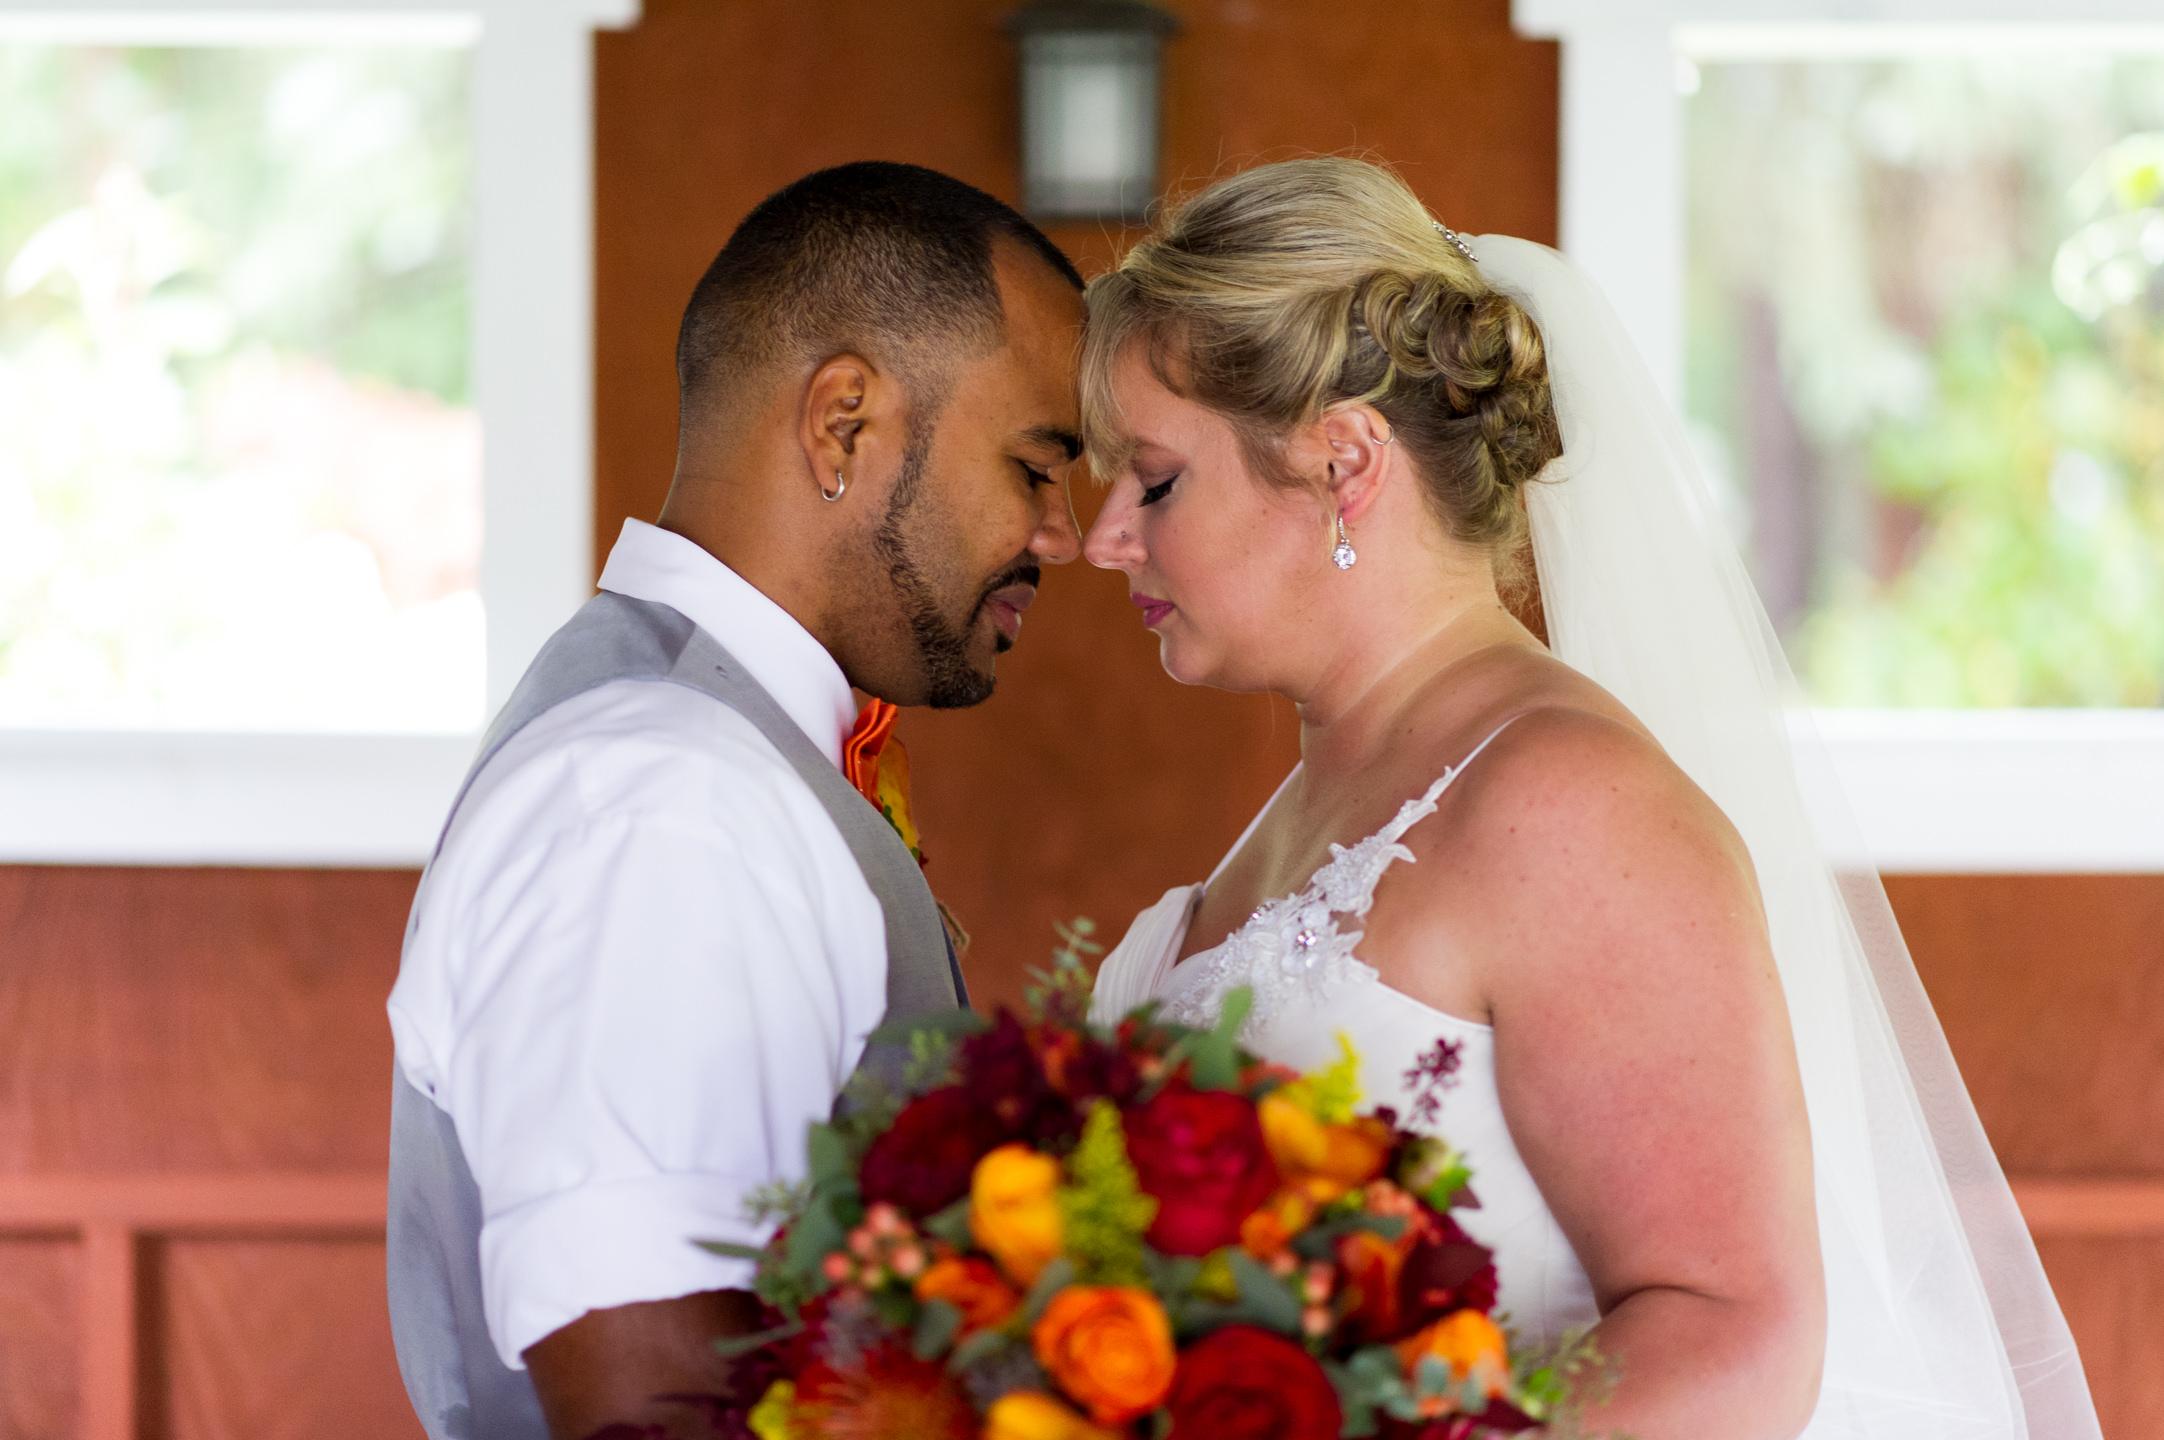 20160917_Tat_Renee and Marcus Wedding-26.jpg